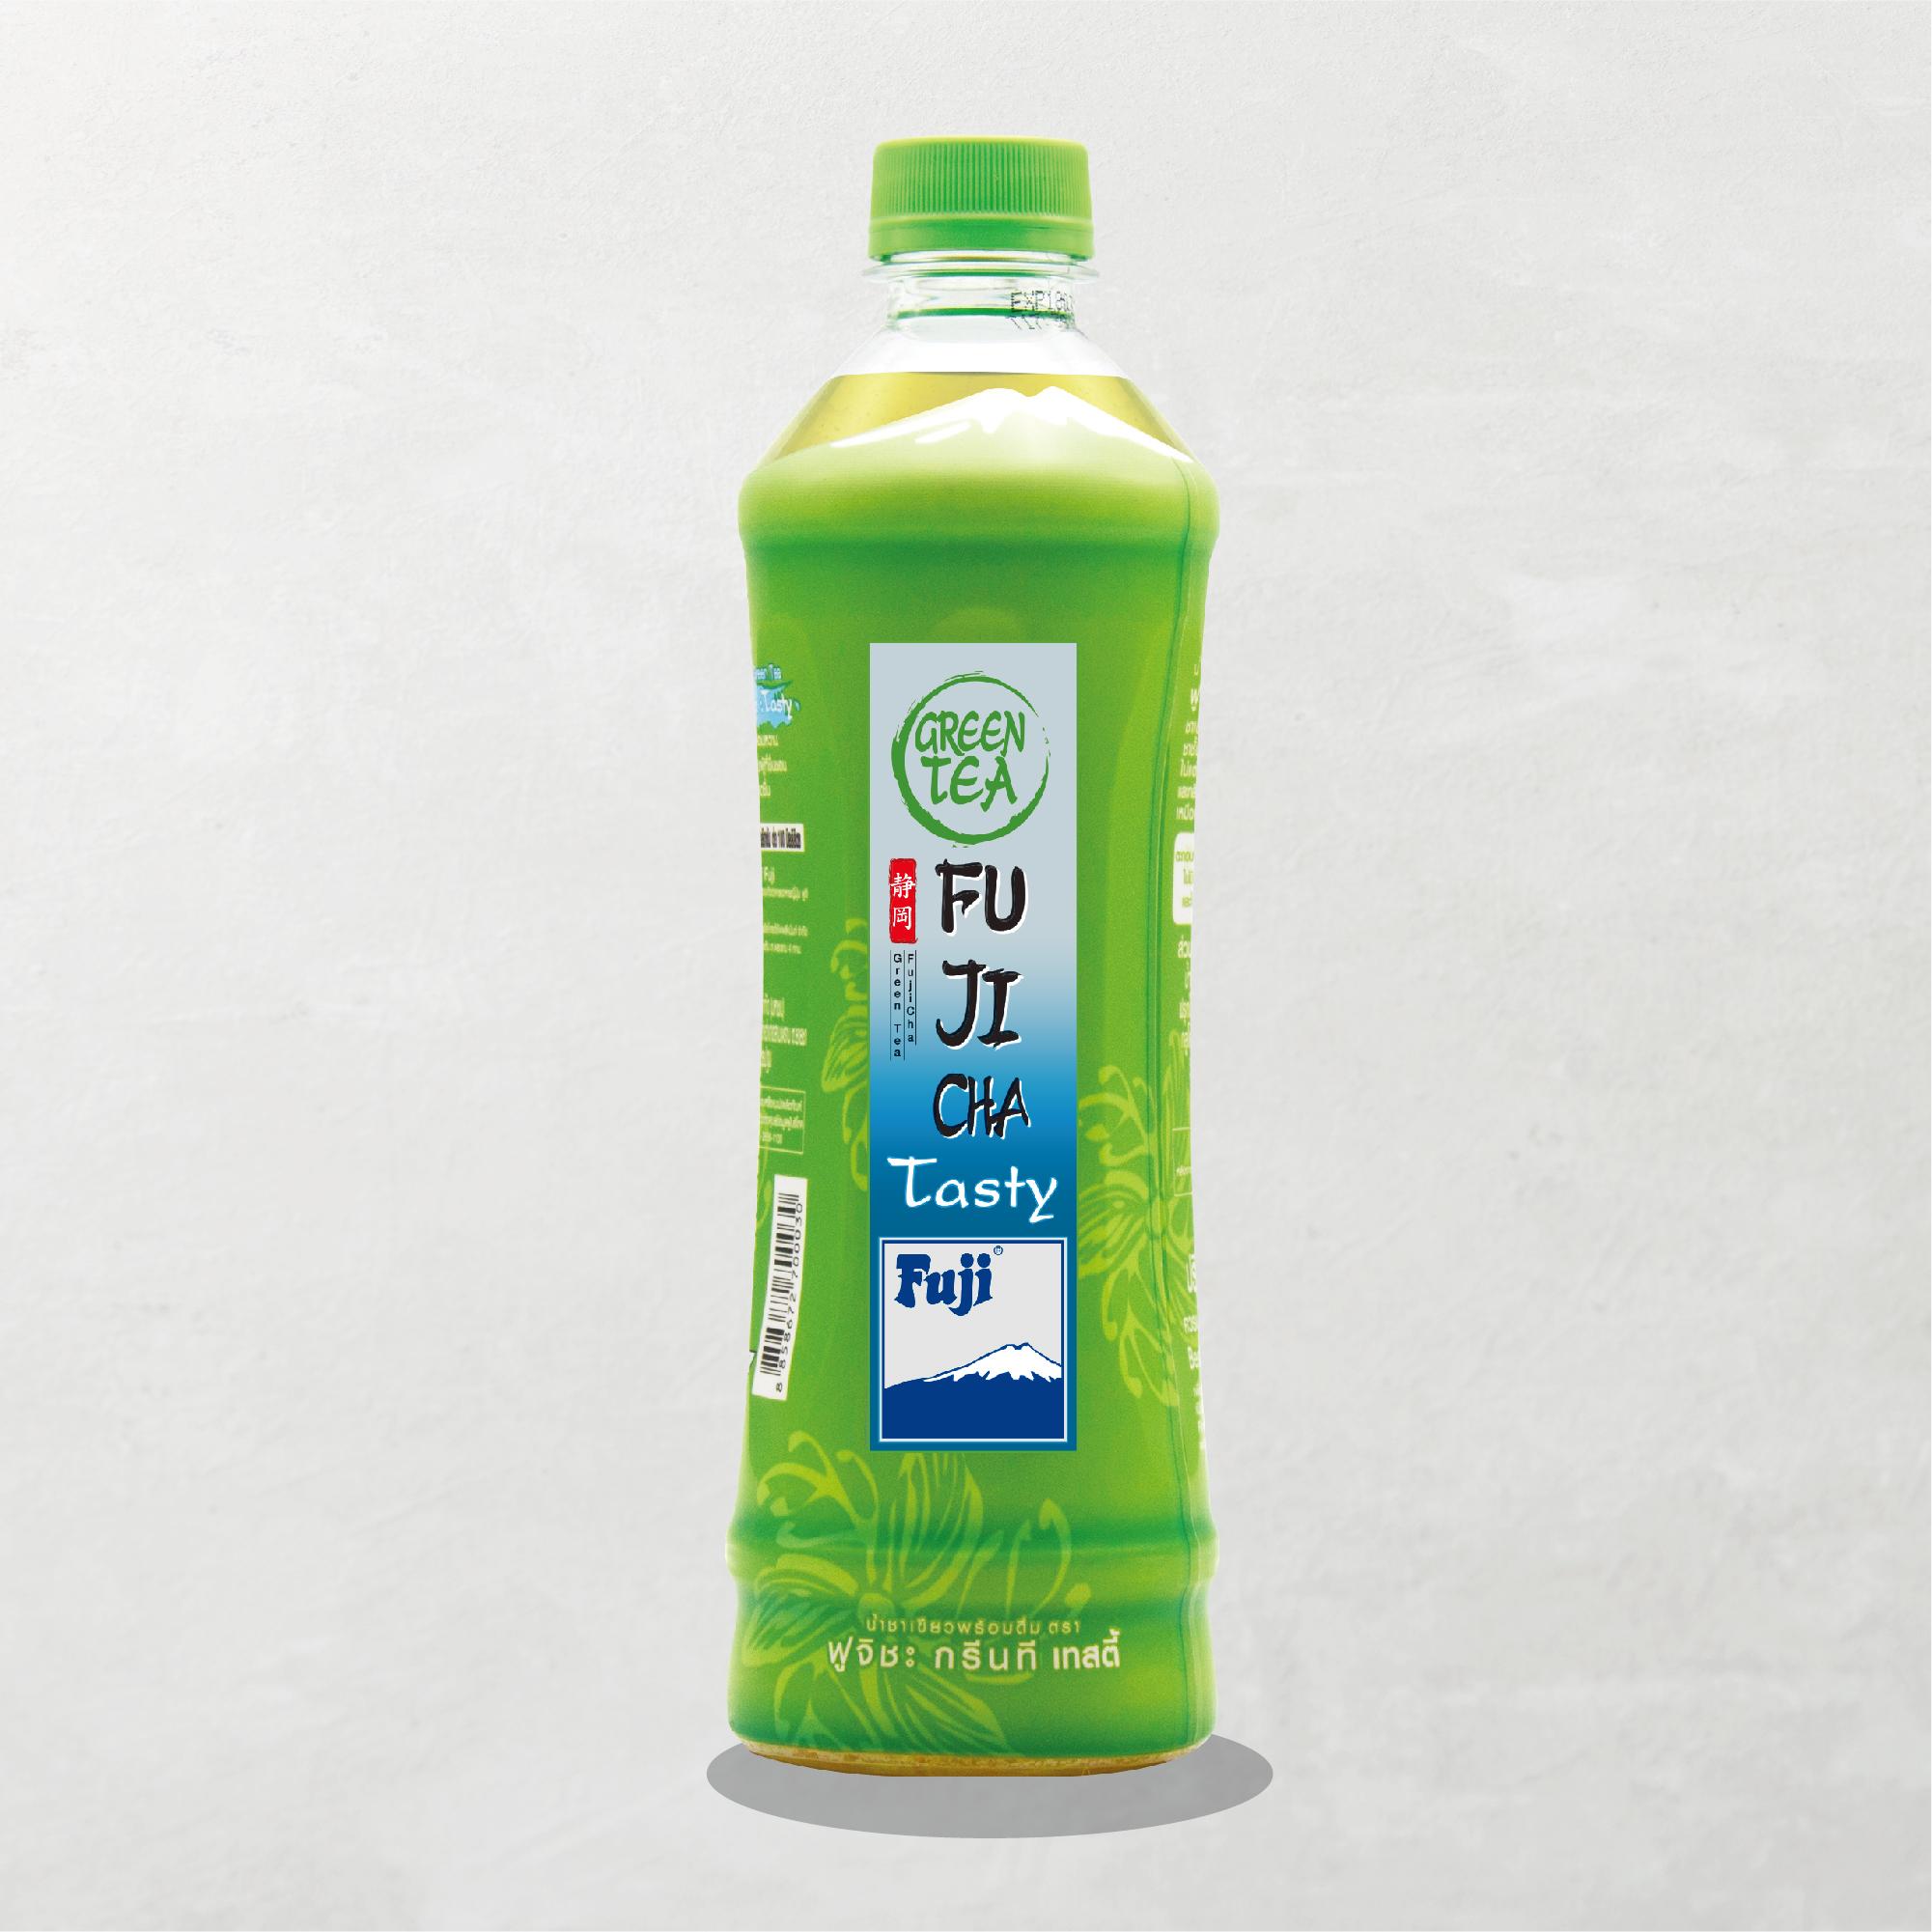 Japanese Green Tea Tasty